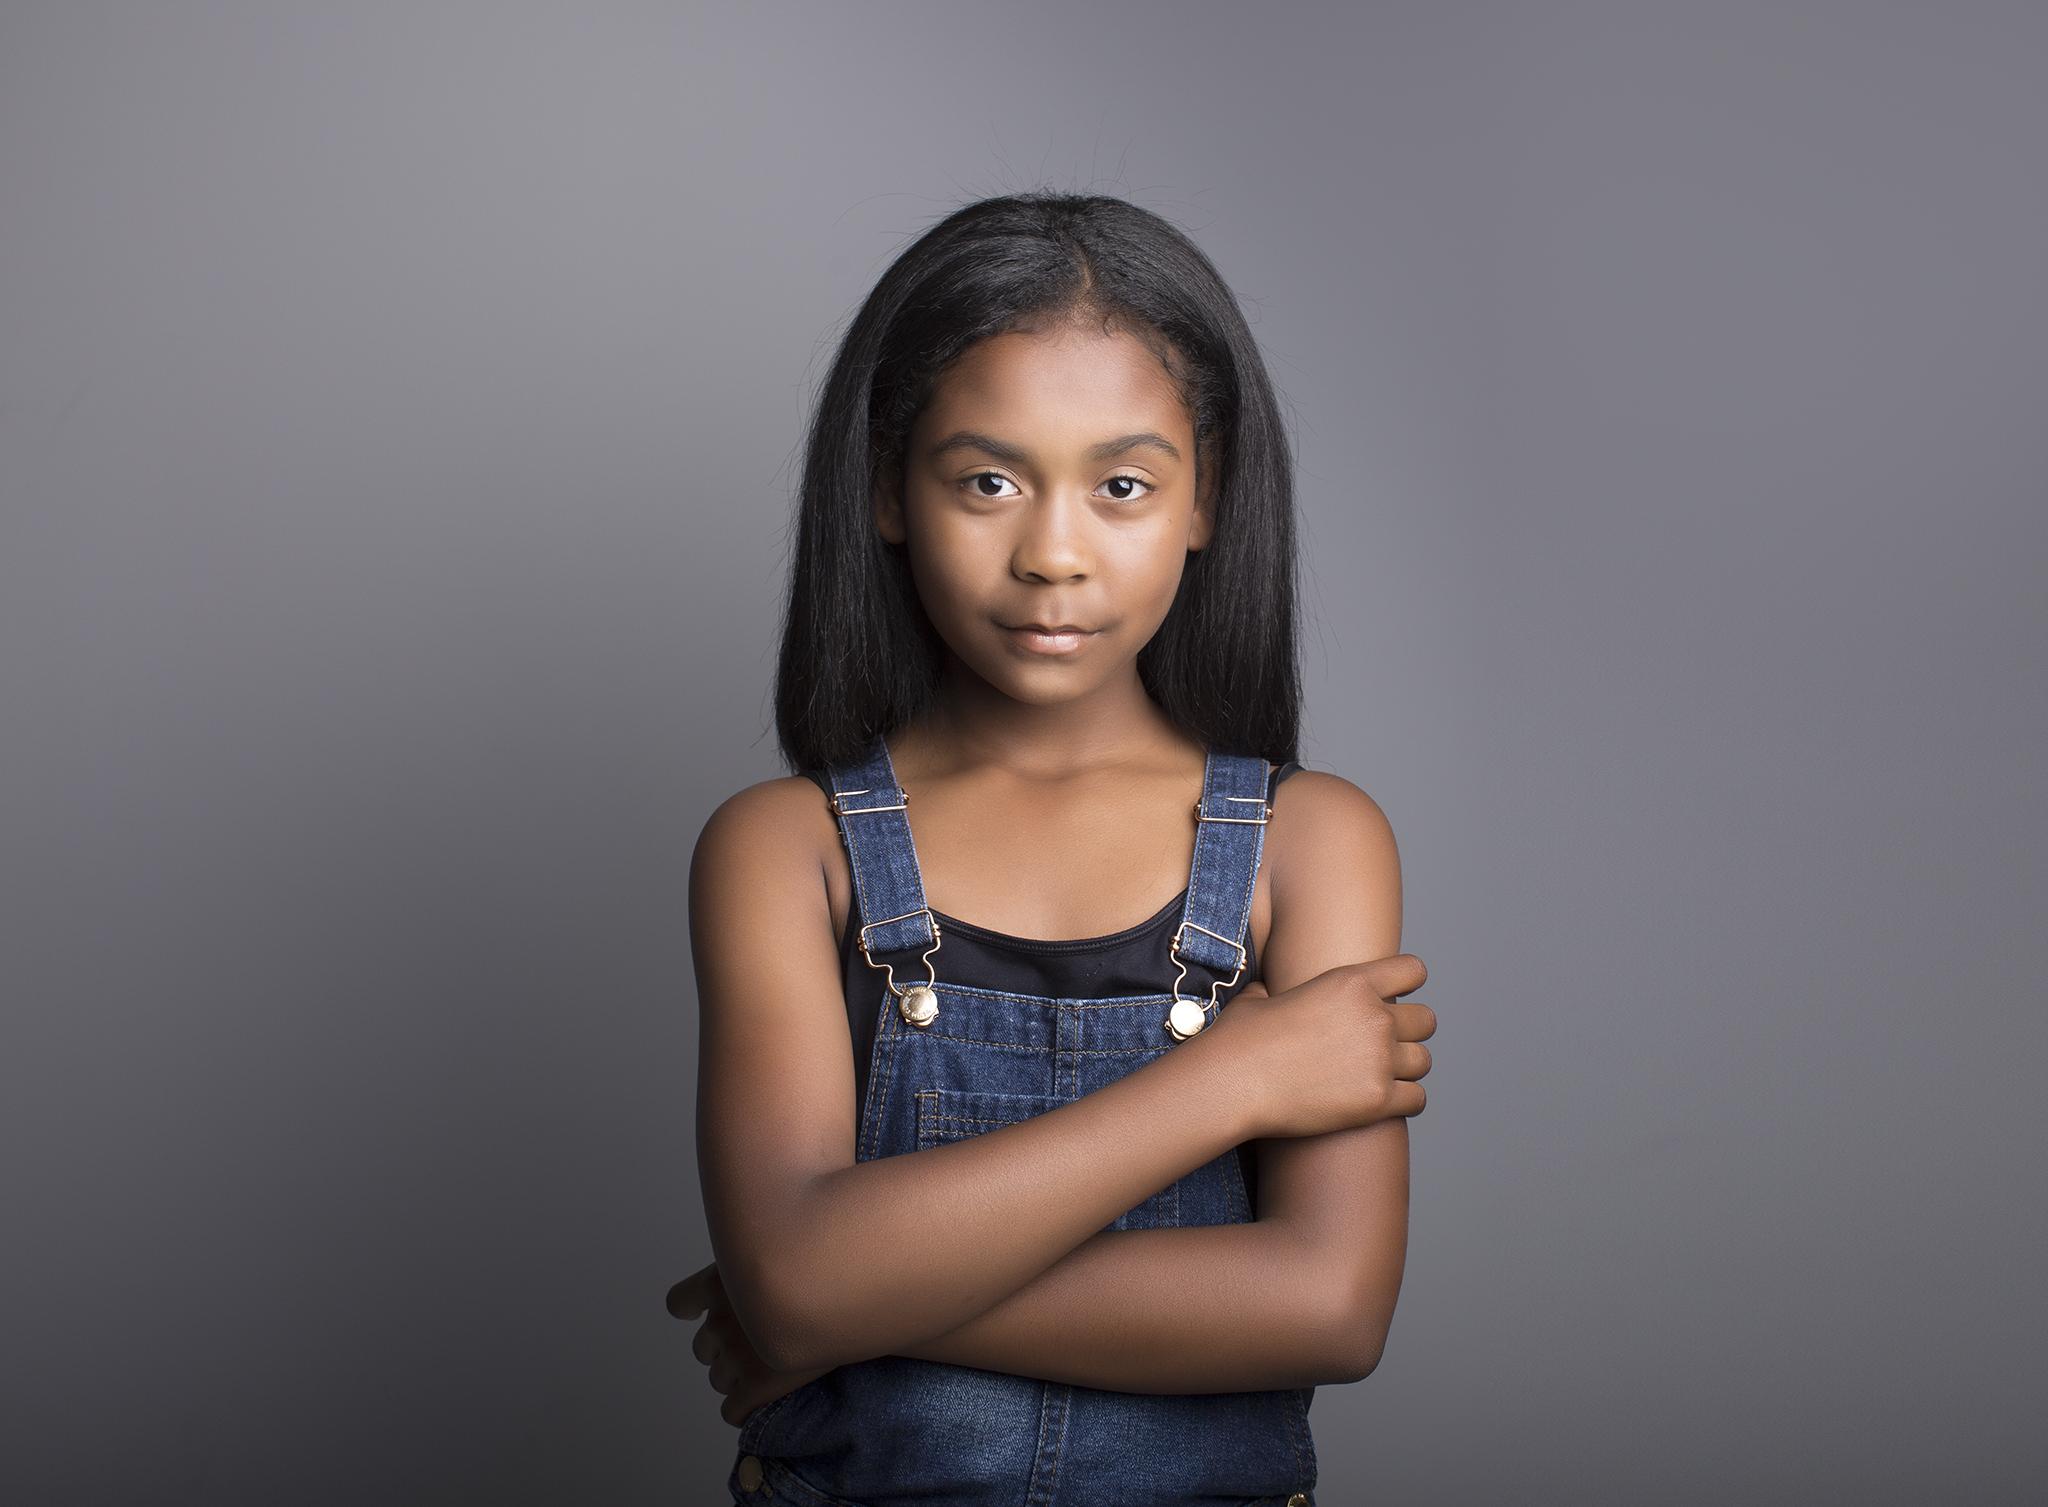 elizabethgphotography_fineart_kingslangley_hertfordshire_child_model_asia-leigh_2.jpg